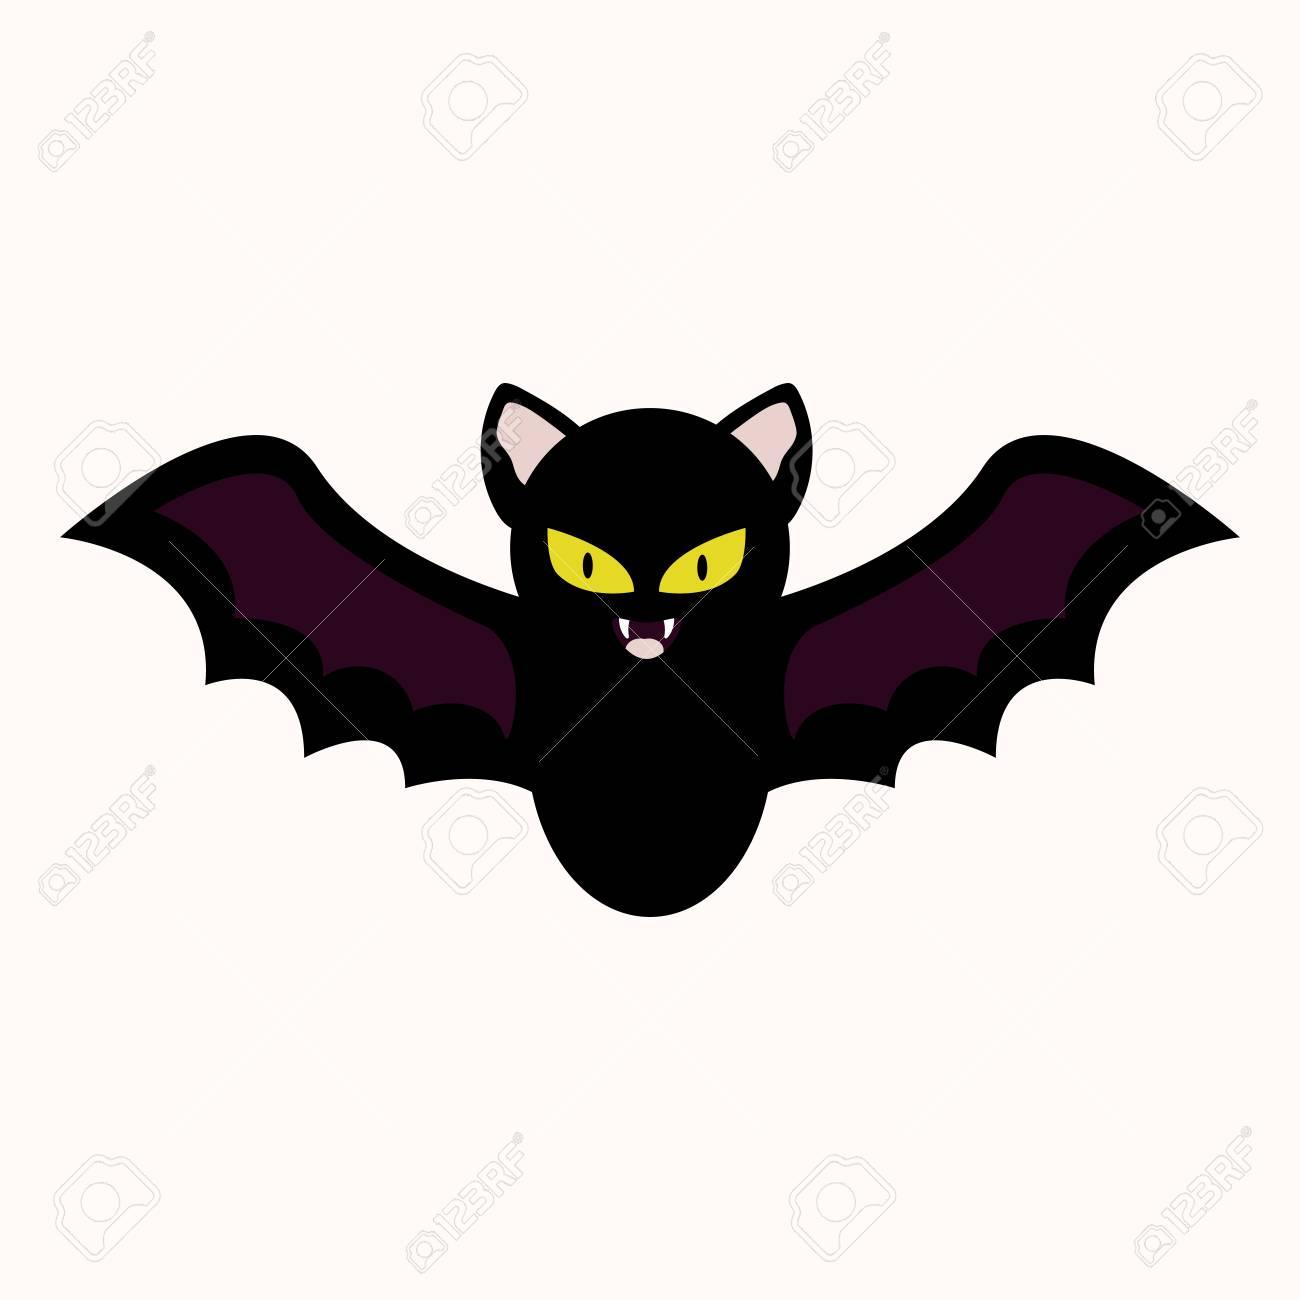 hight resolution of cartoon bat vector illustration halloween spooky character clipart icon stock vector 109853025